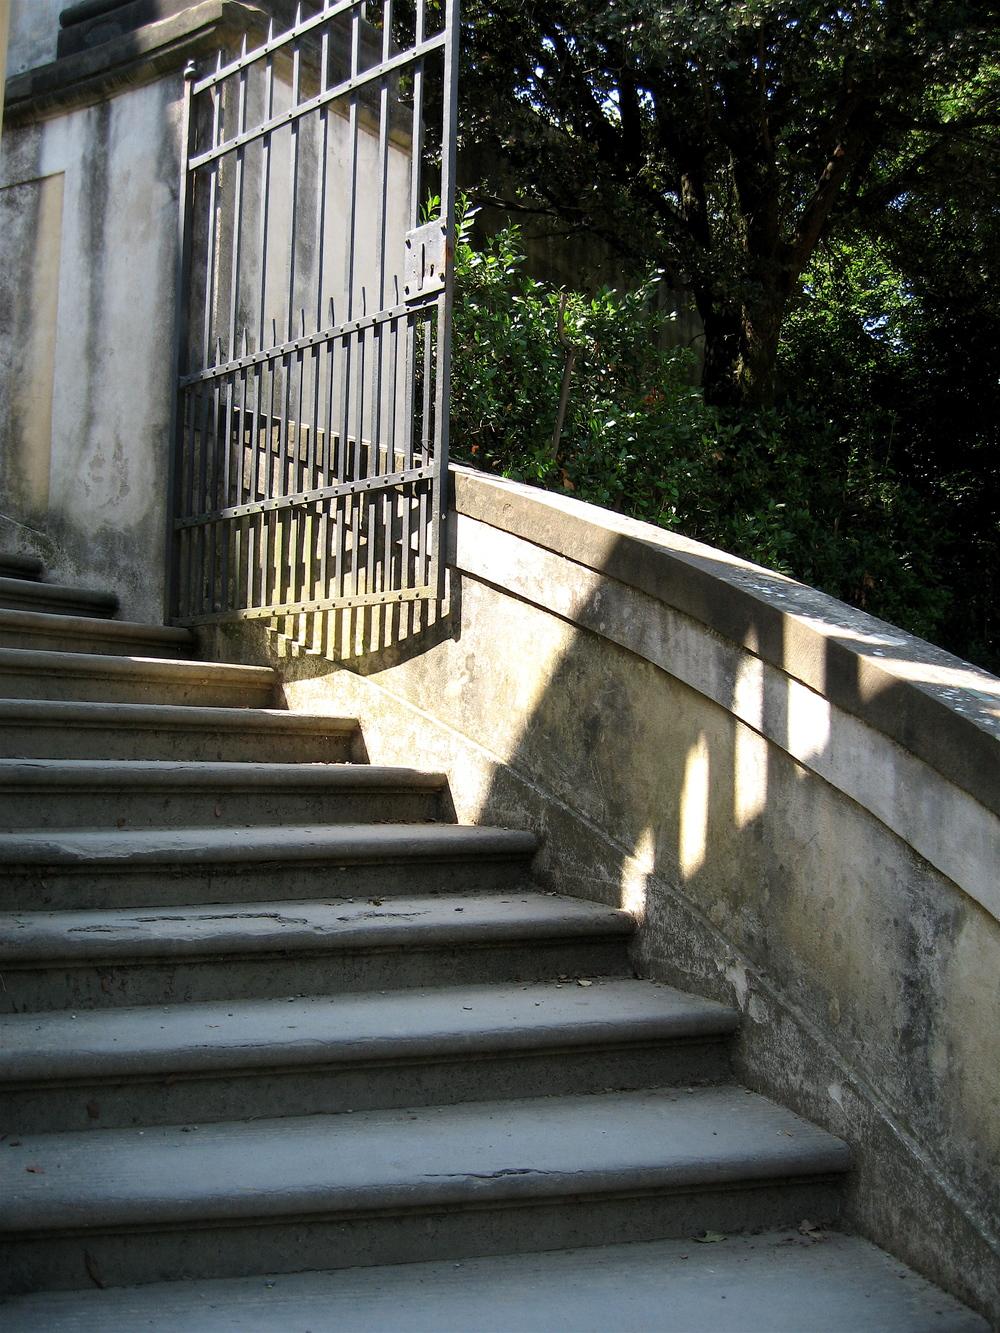 Stairs in the Boboli Gardens